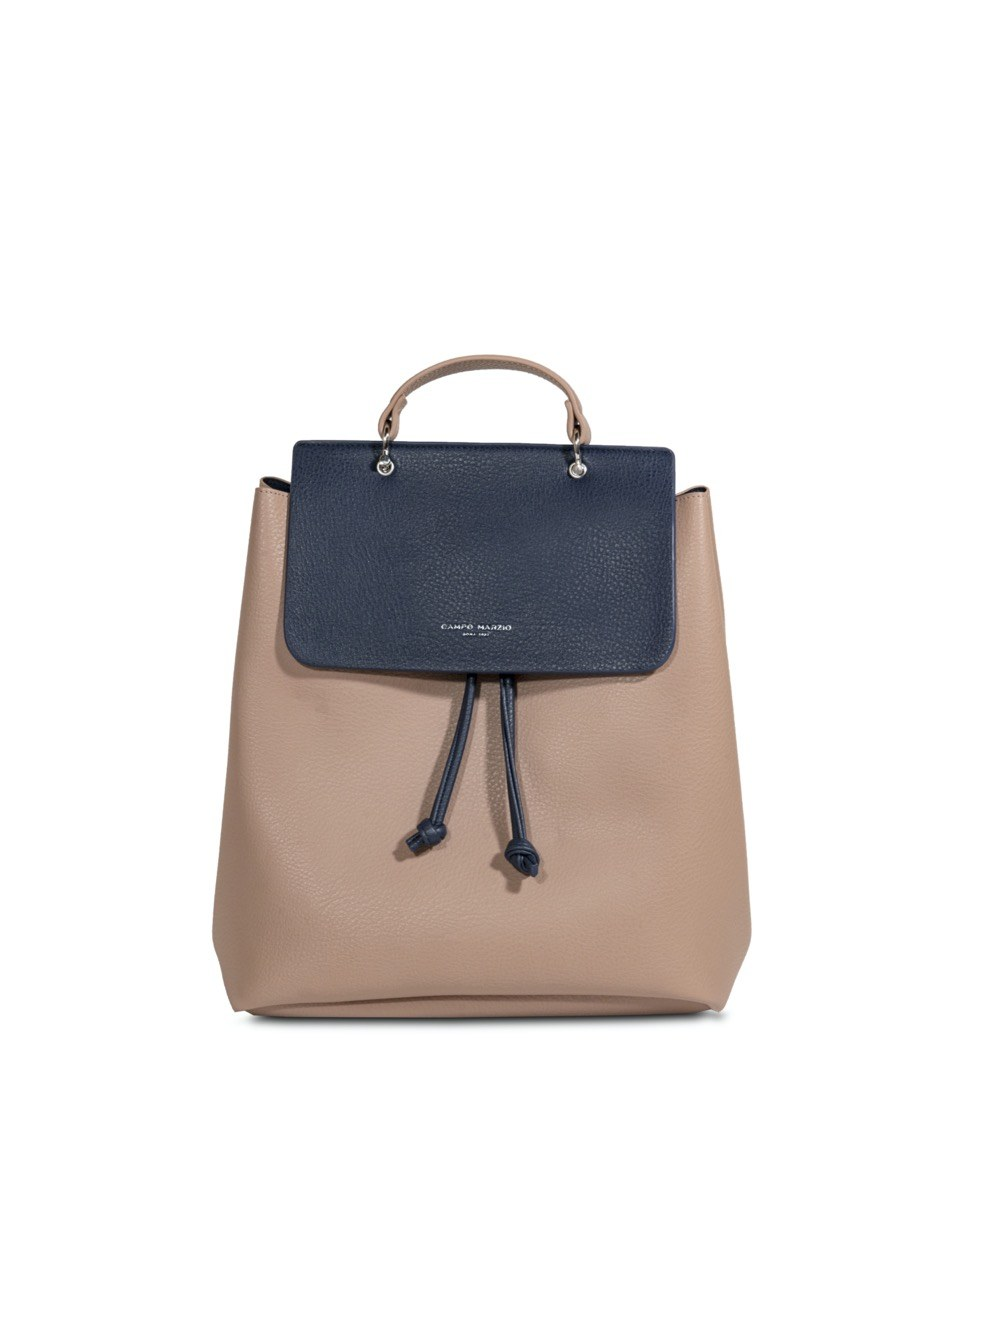 Fannie Backpack Handbag - Sand